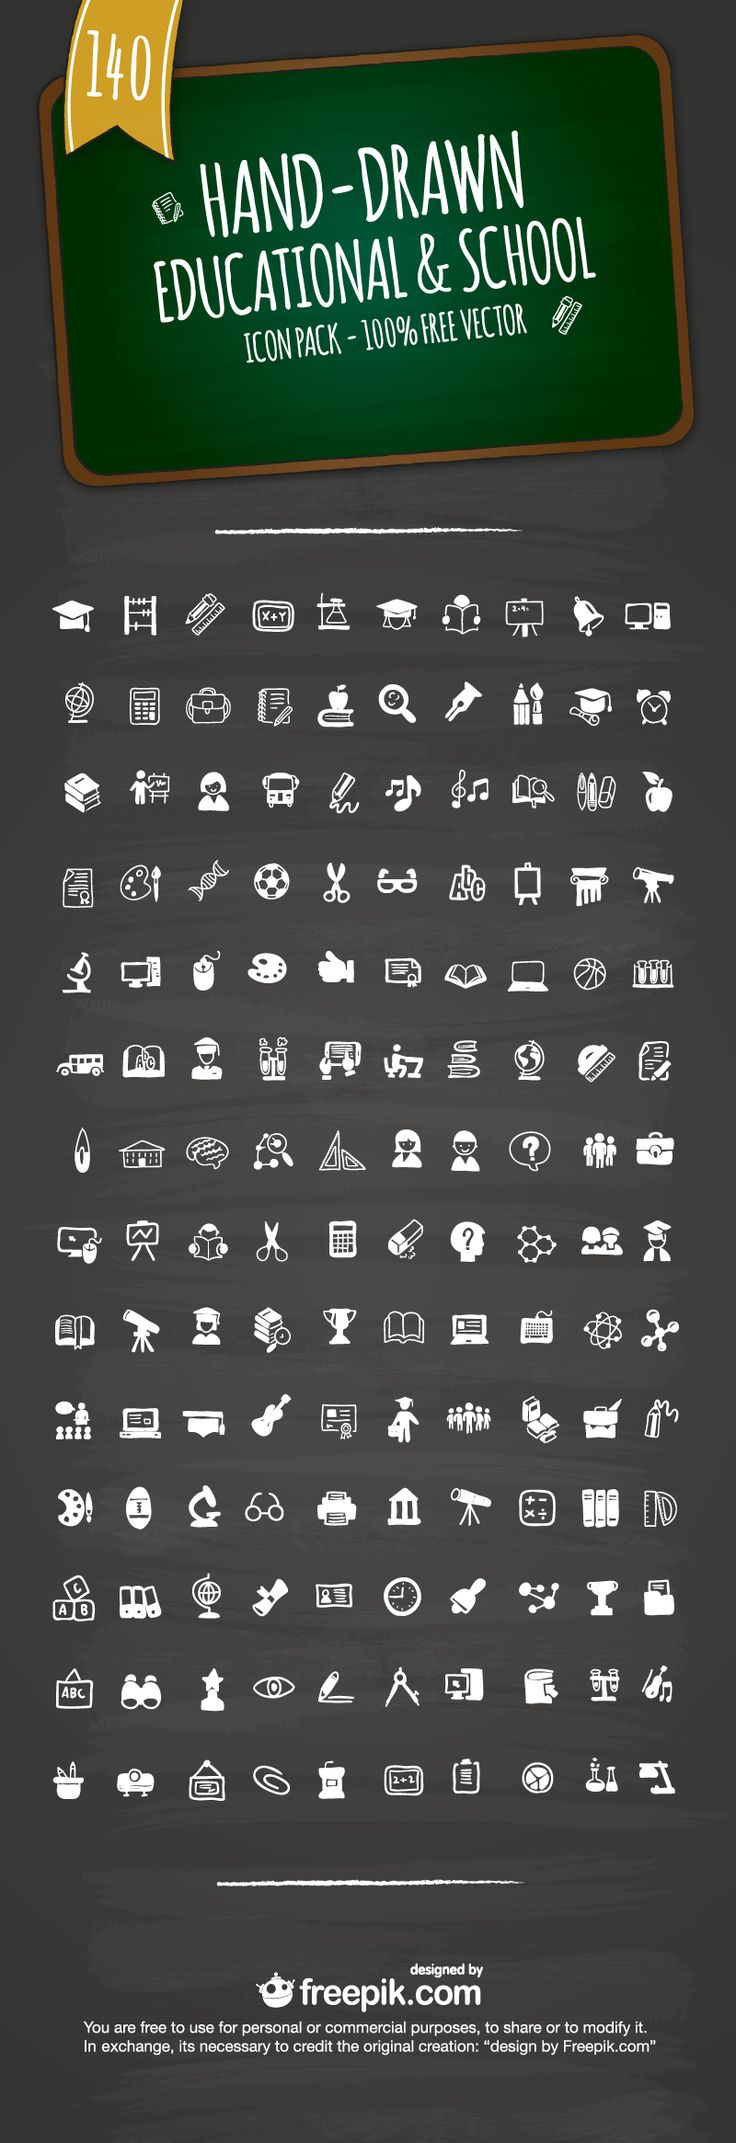 Free Hand-Drawn Educational&School  Icons  http://blog.templatemonster.com/2014/07/30/freebies-pack-hand-drawn-svg-icons/?utm_source=Pinterest&utm_medium=Blog&utm_campaign=FrIcPPPnF